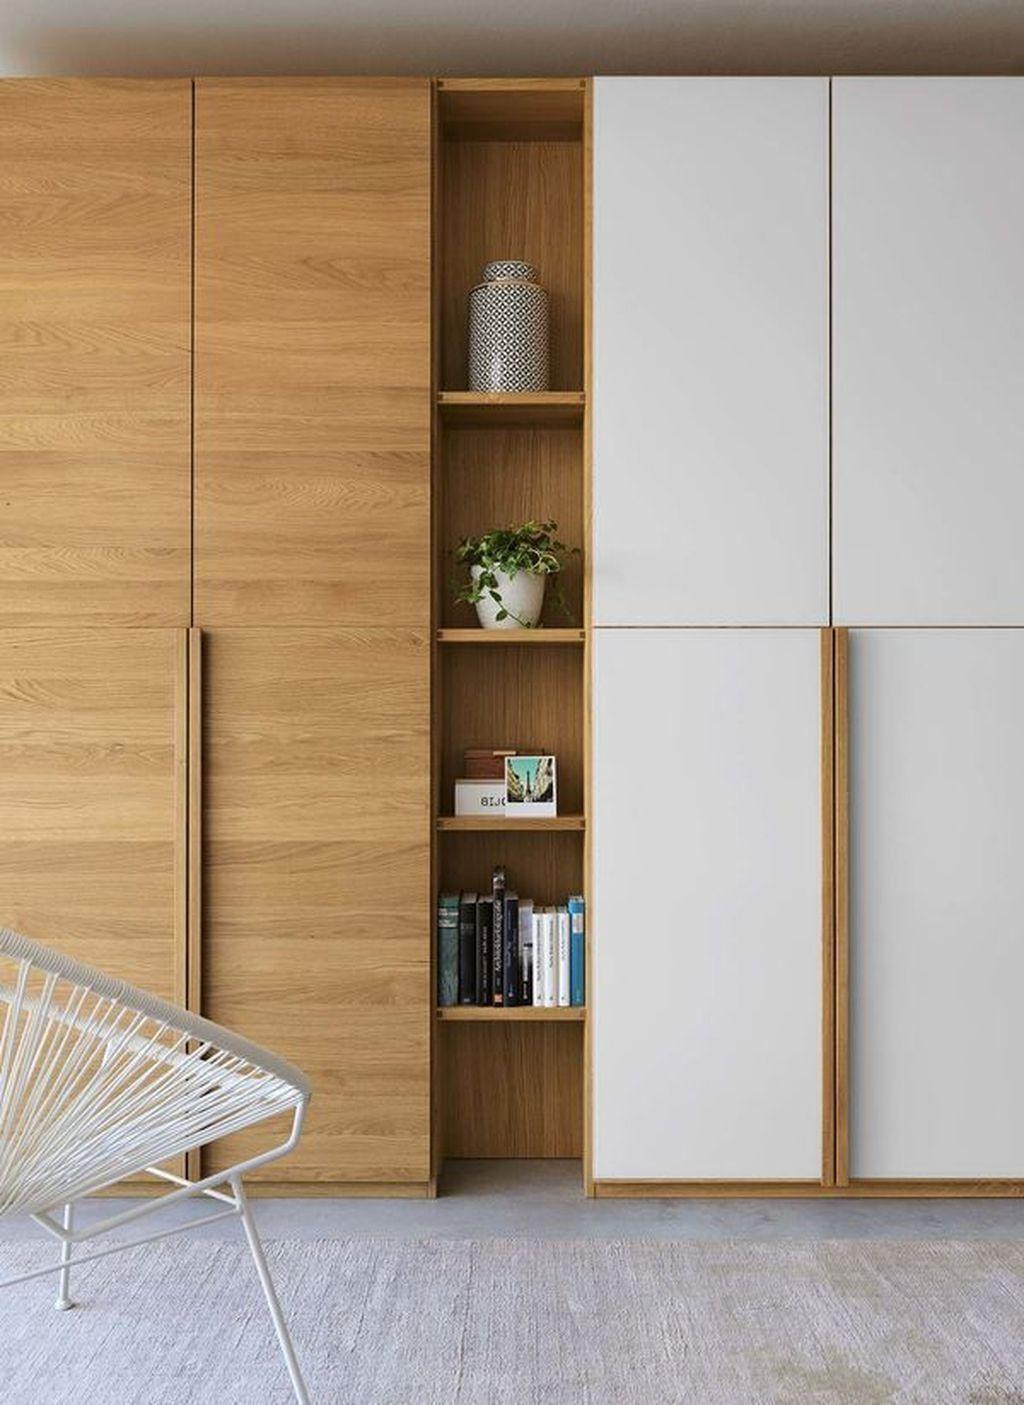 20 Elegant Wardrobe Design Ideas For Your Small Bedroom Cool 20 Elegant War Bed In 2020 Kleiderschrank Design Ideen Fur Kleine Schlafzimmer Schlafzimmer Design